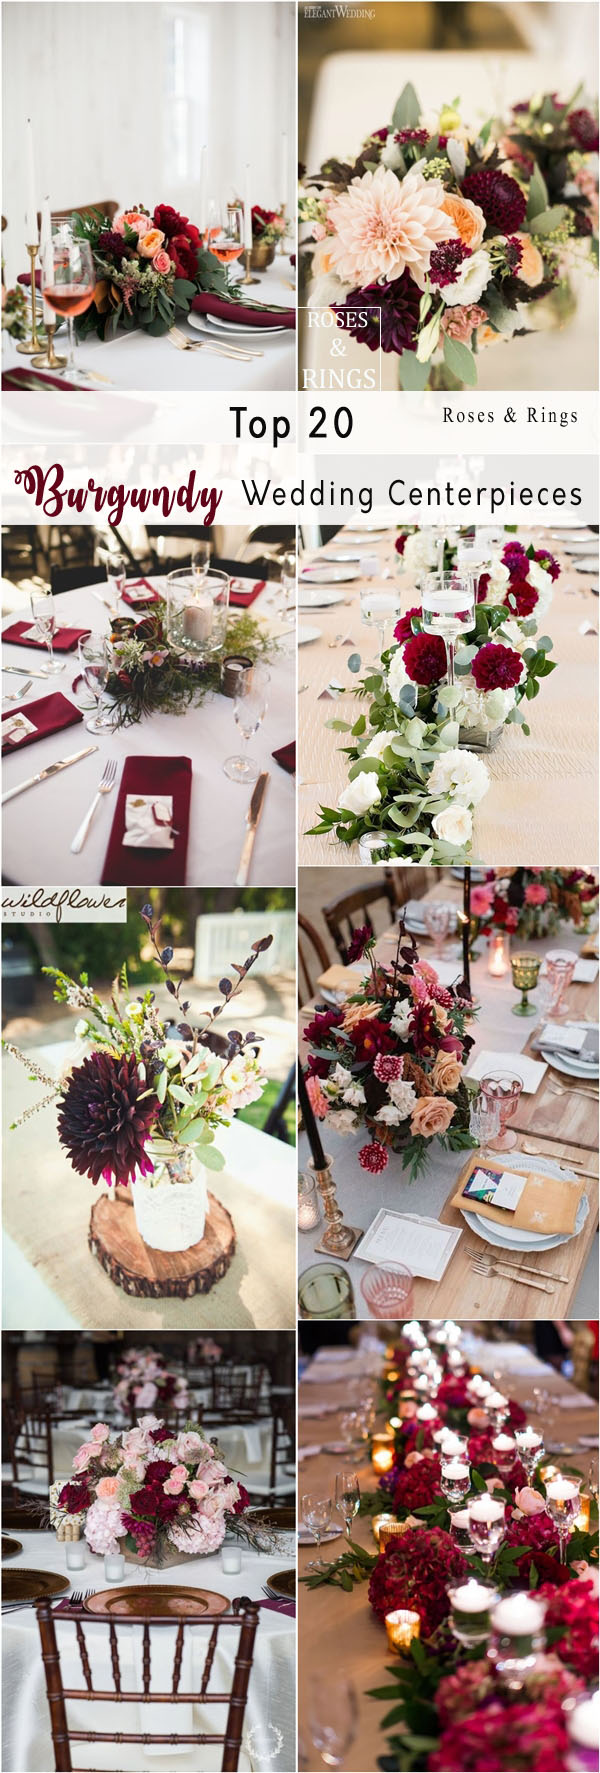 20 Burgundy Wedding Centerpieces | Roses & Rings